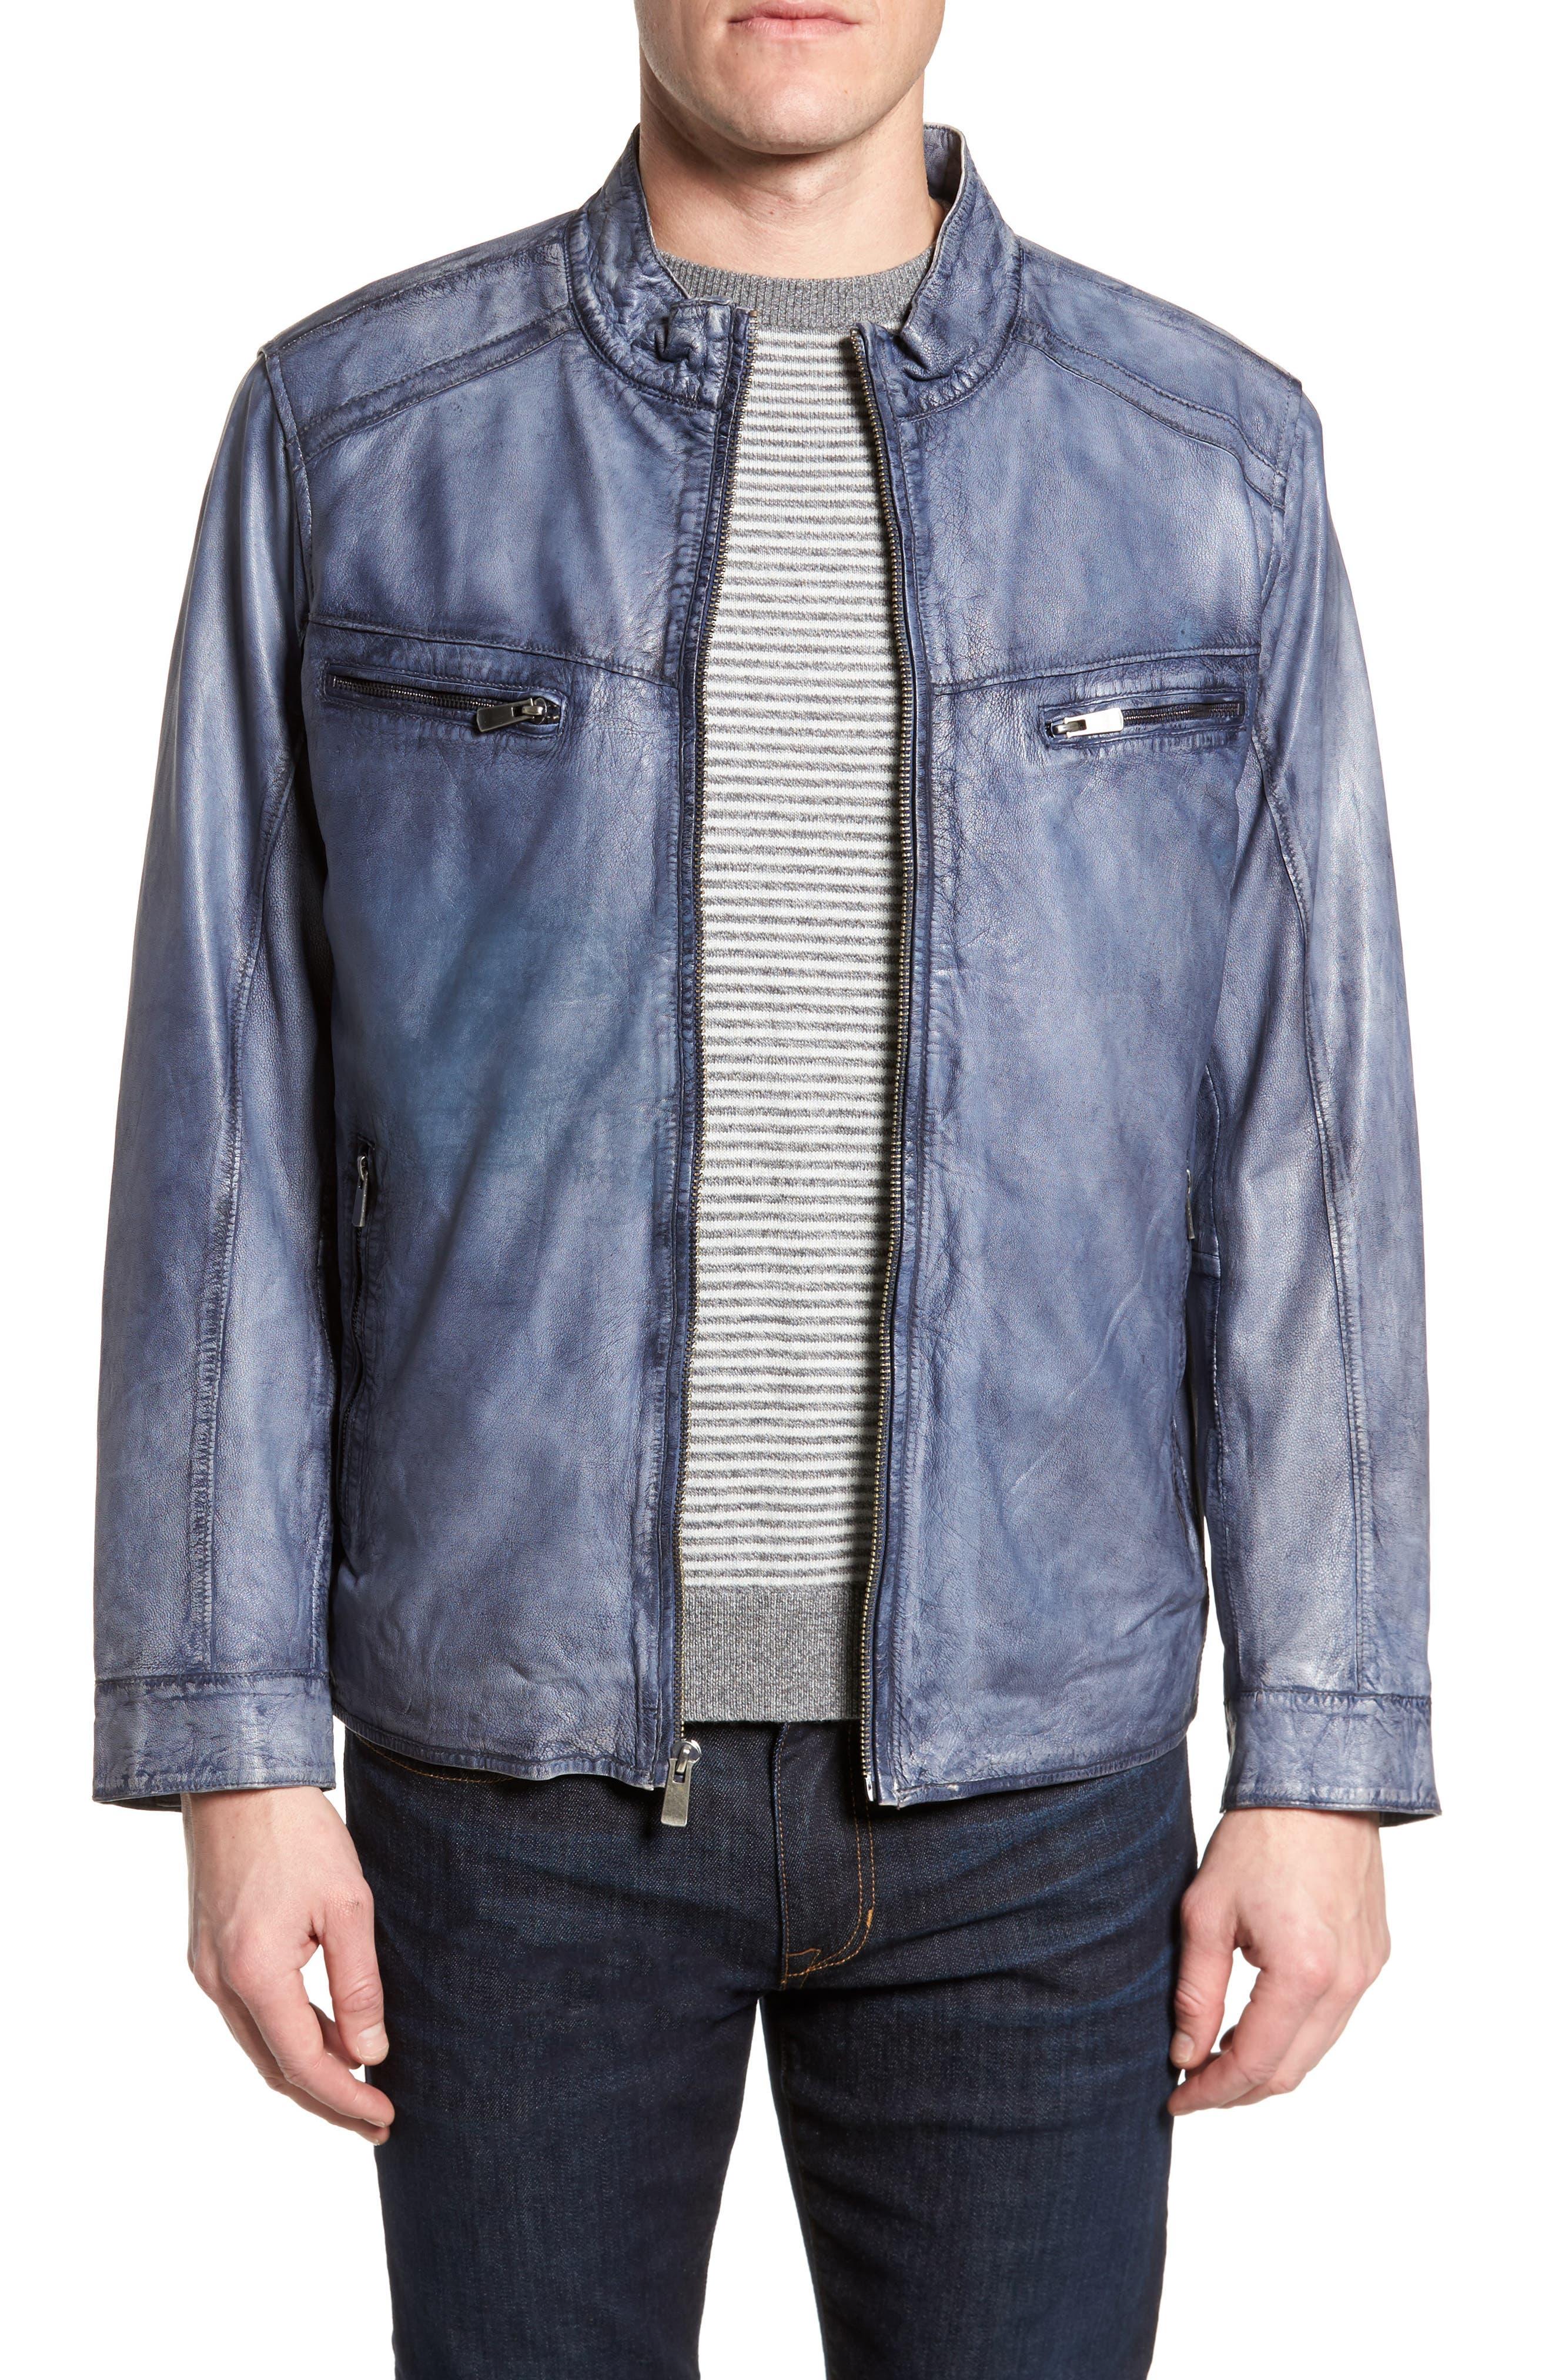 Abraded Washed Leather Jacket,                             Main thumbnail 1, color,                             450